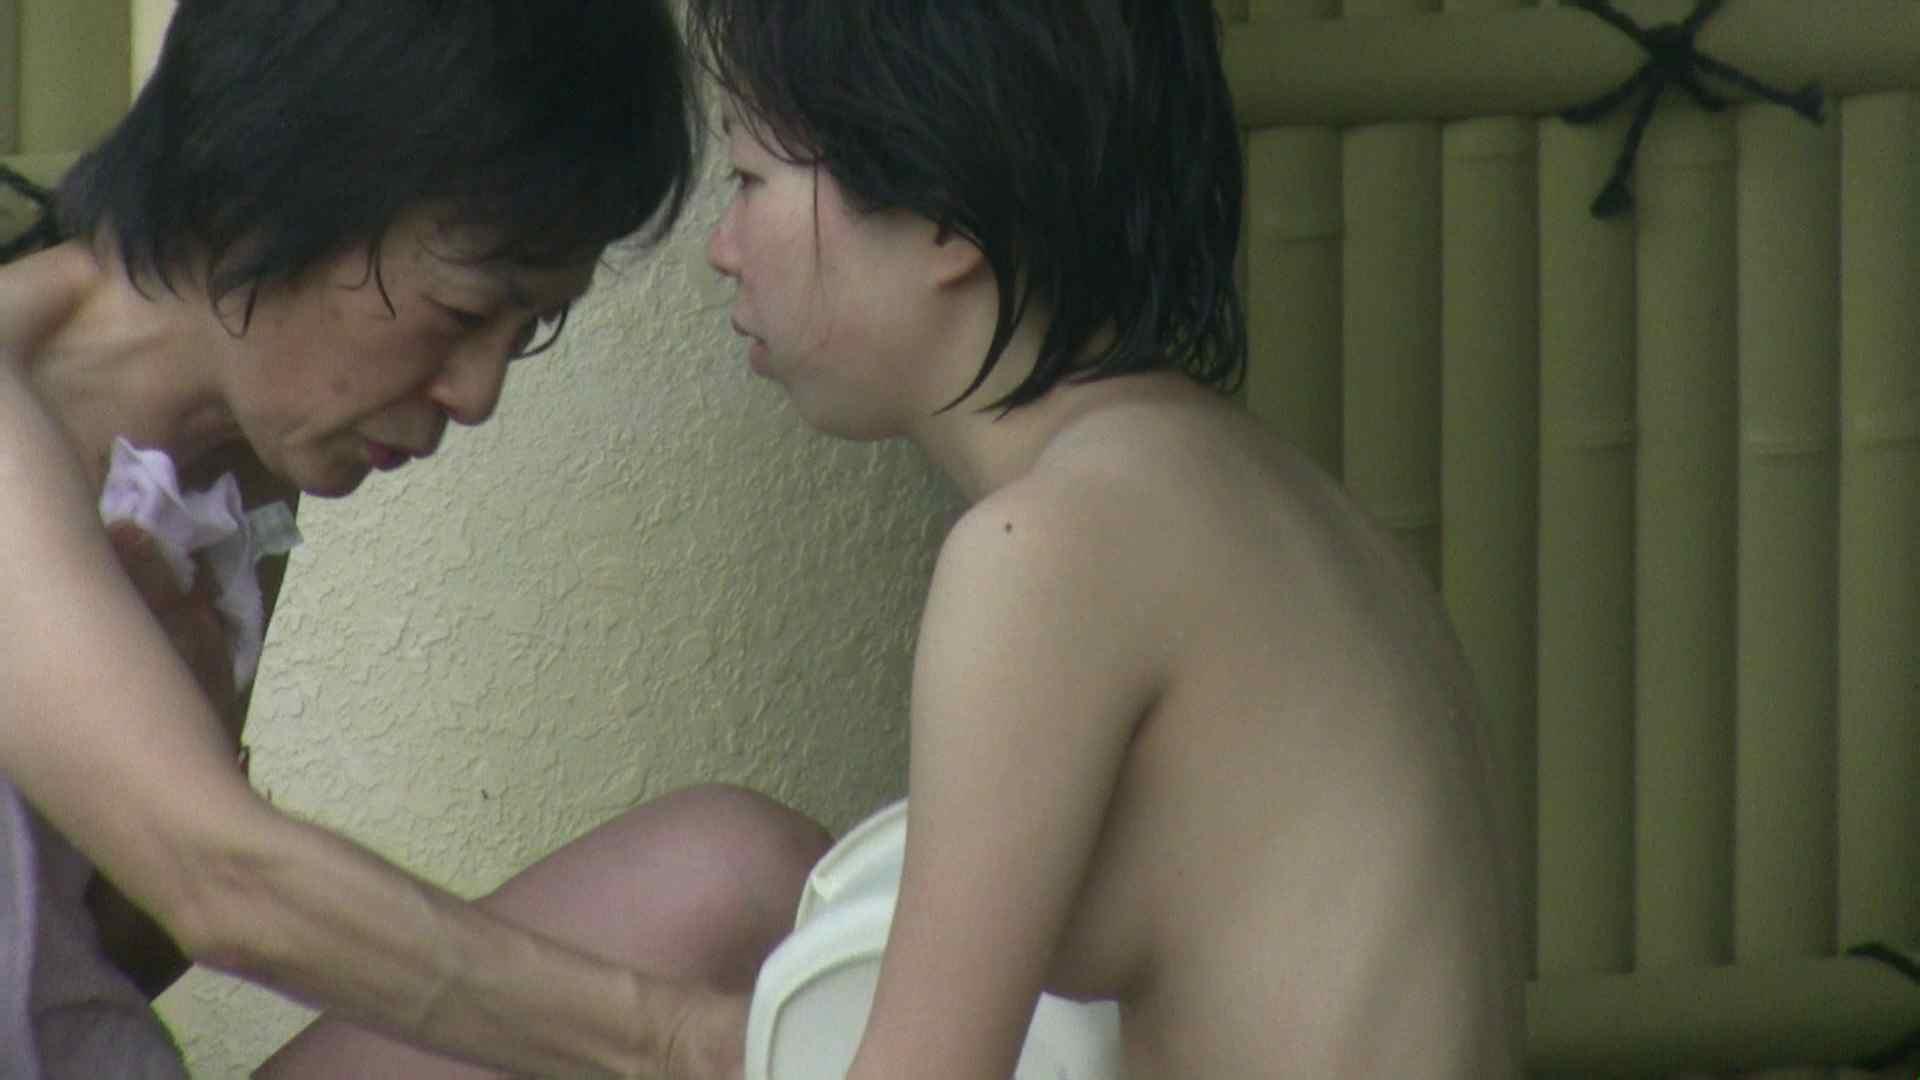 Aquaな露天風呂Vol.06【VIP】 盗撮 | OLエロ画像  113PICs 25